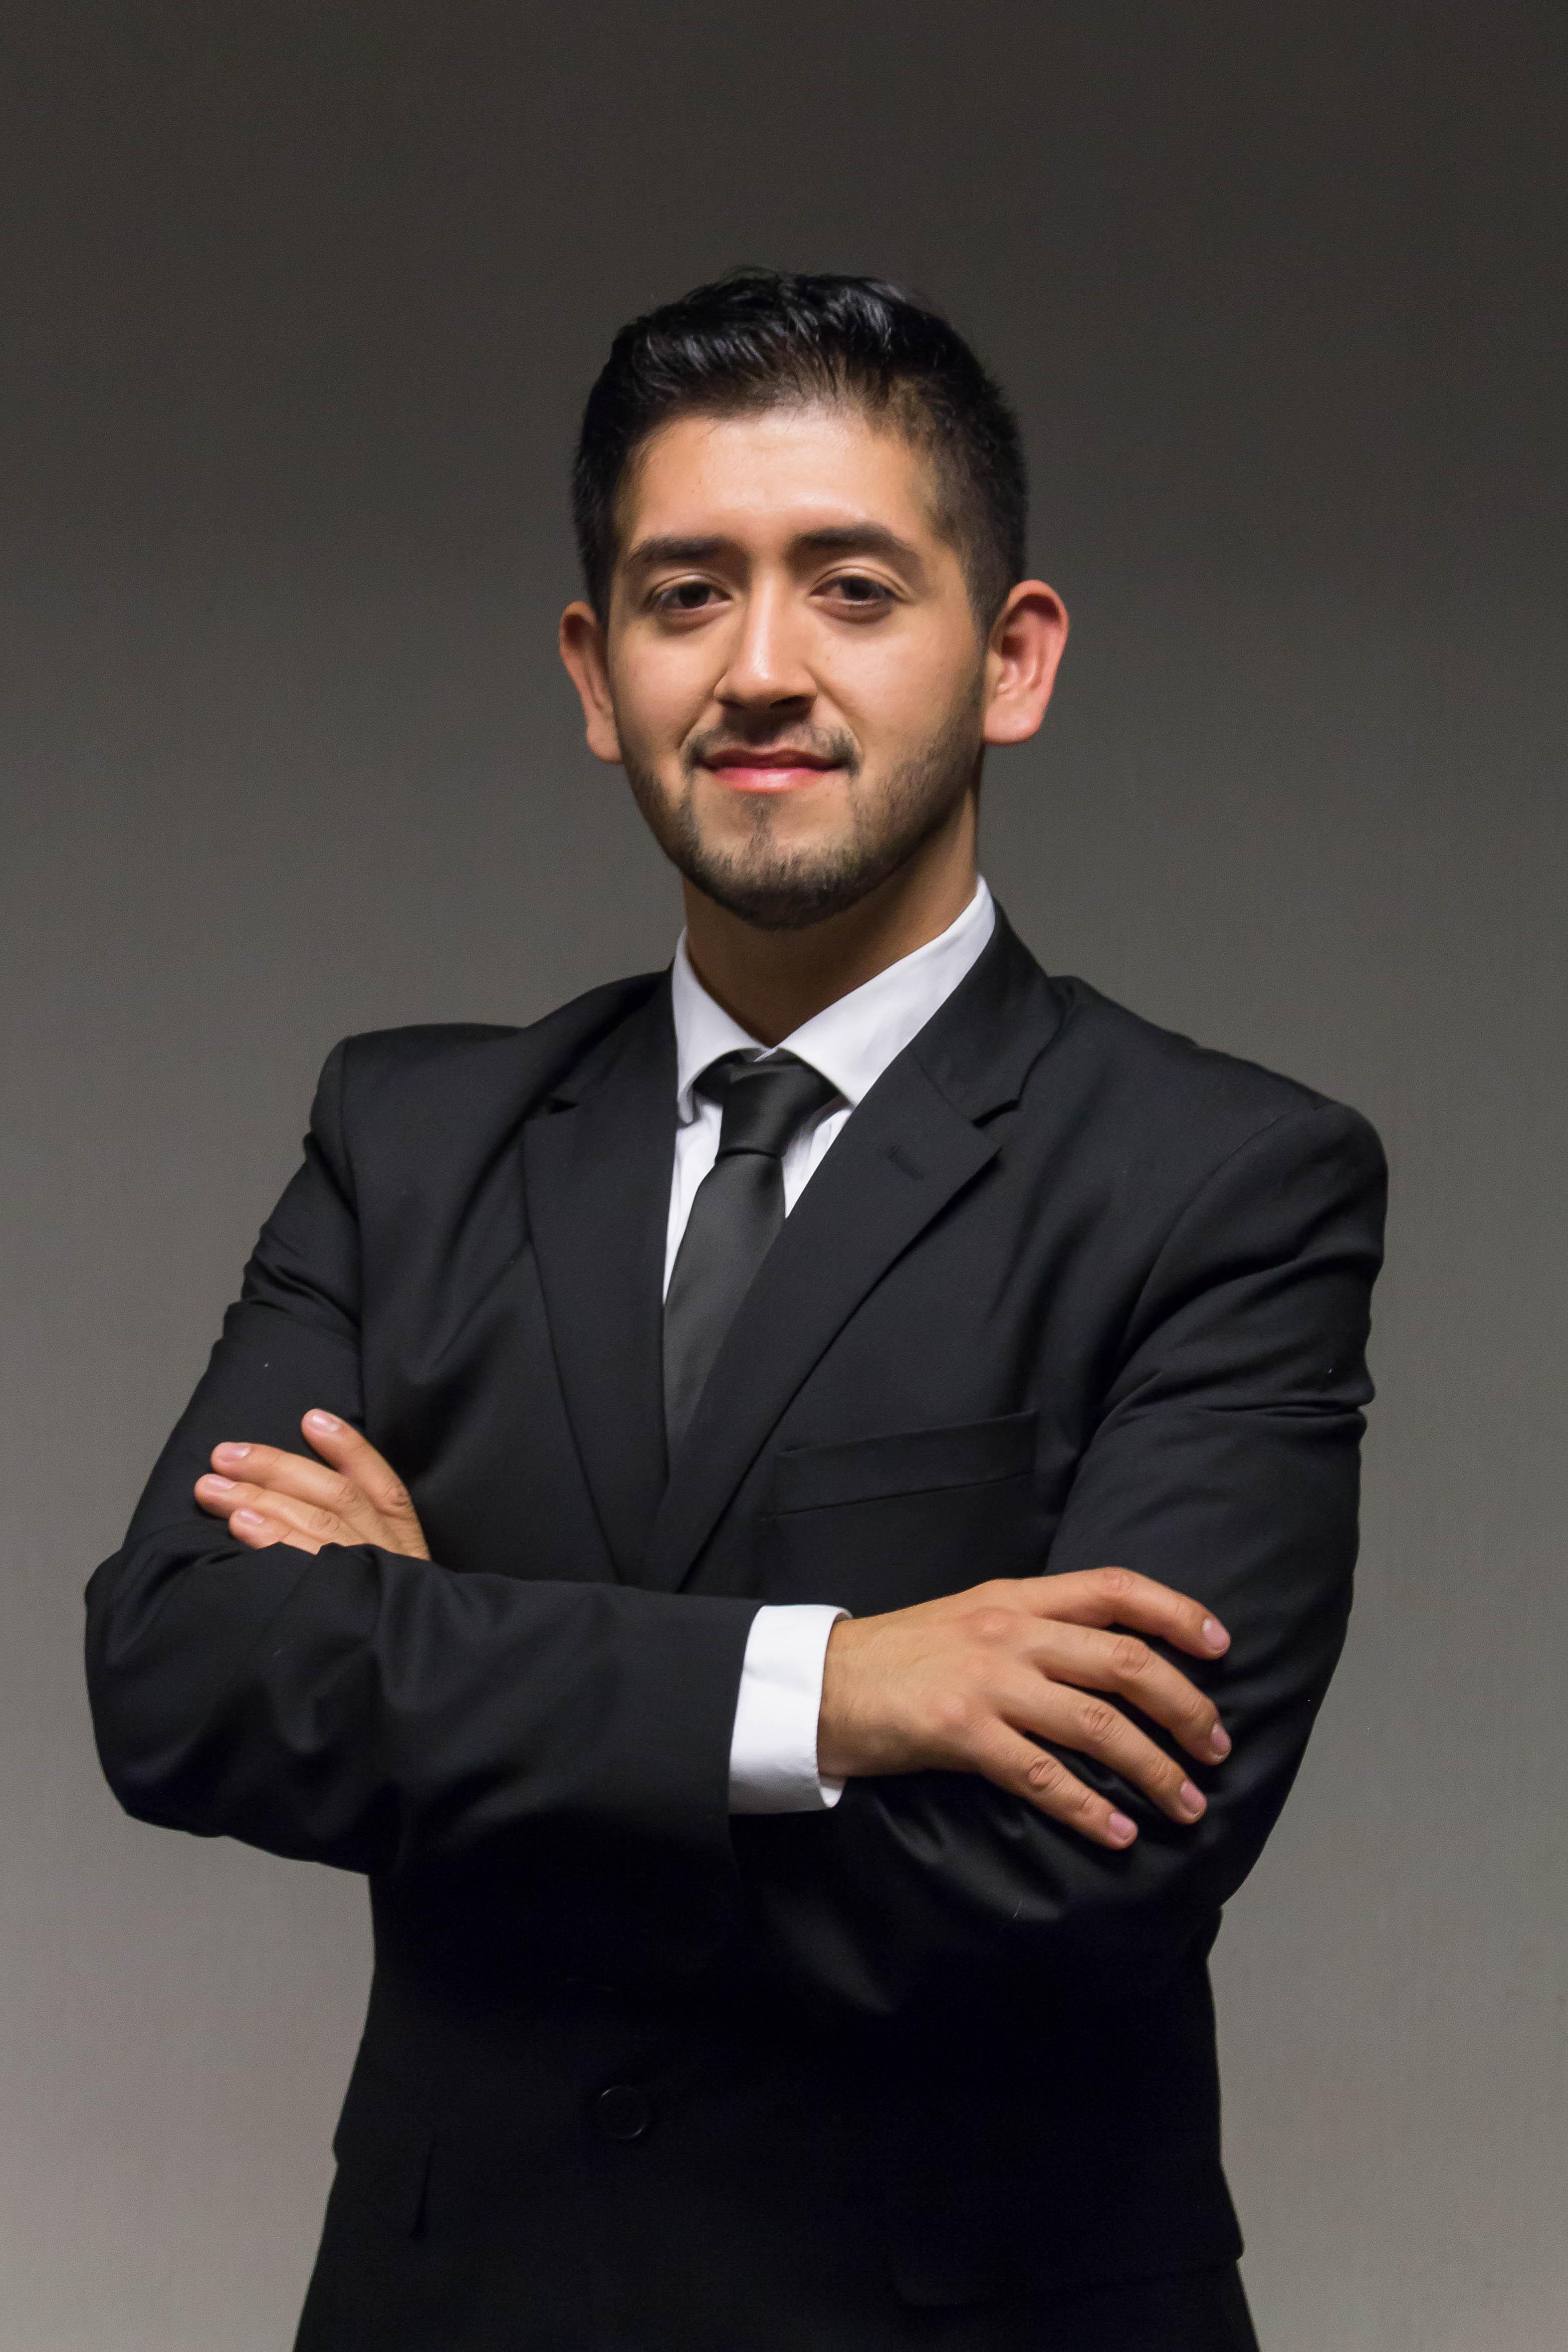 Jorge Santillan